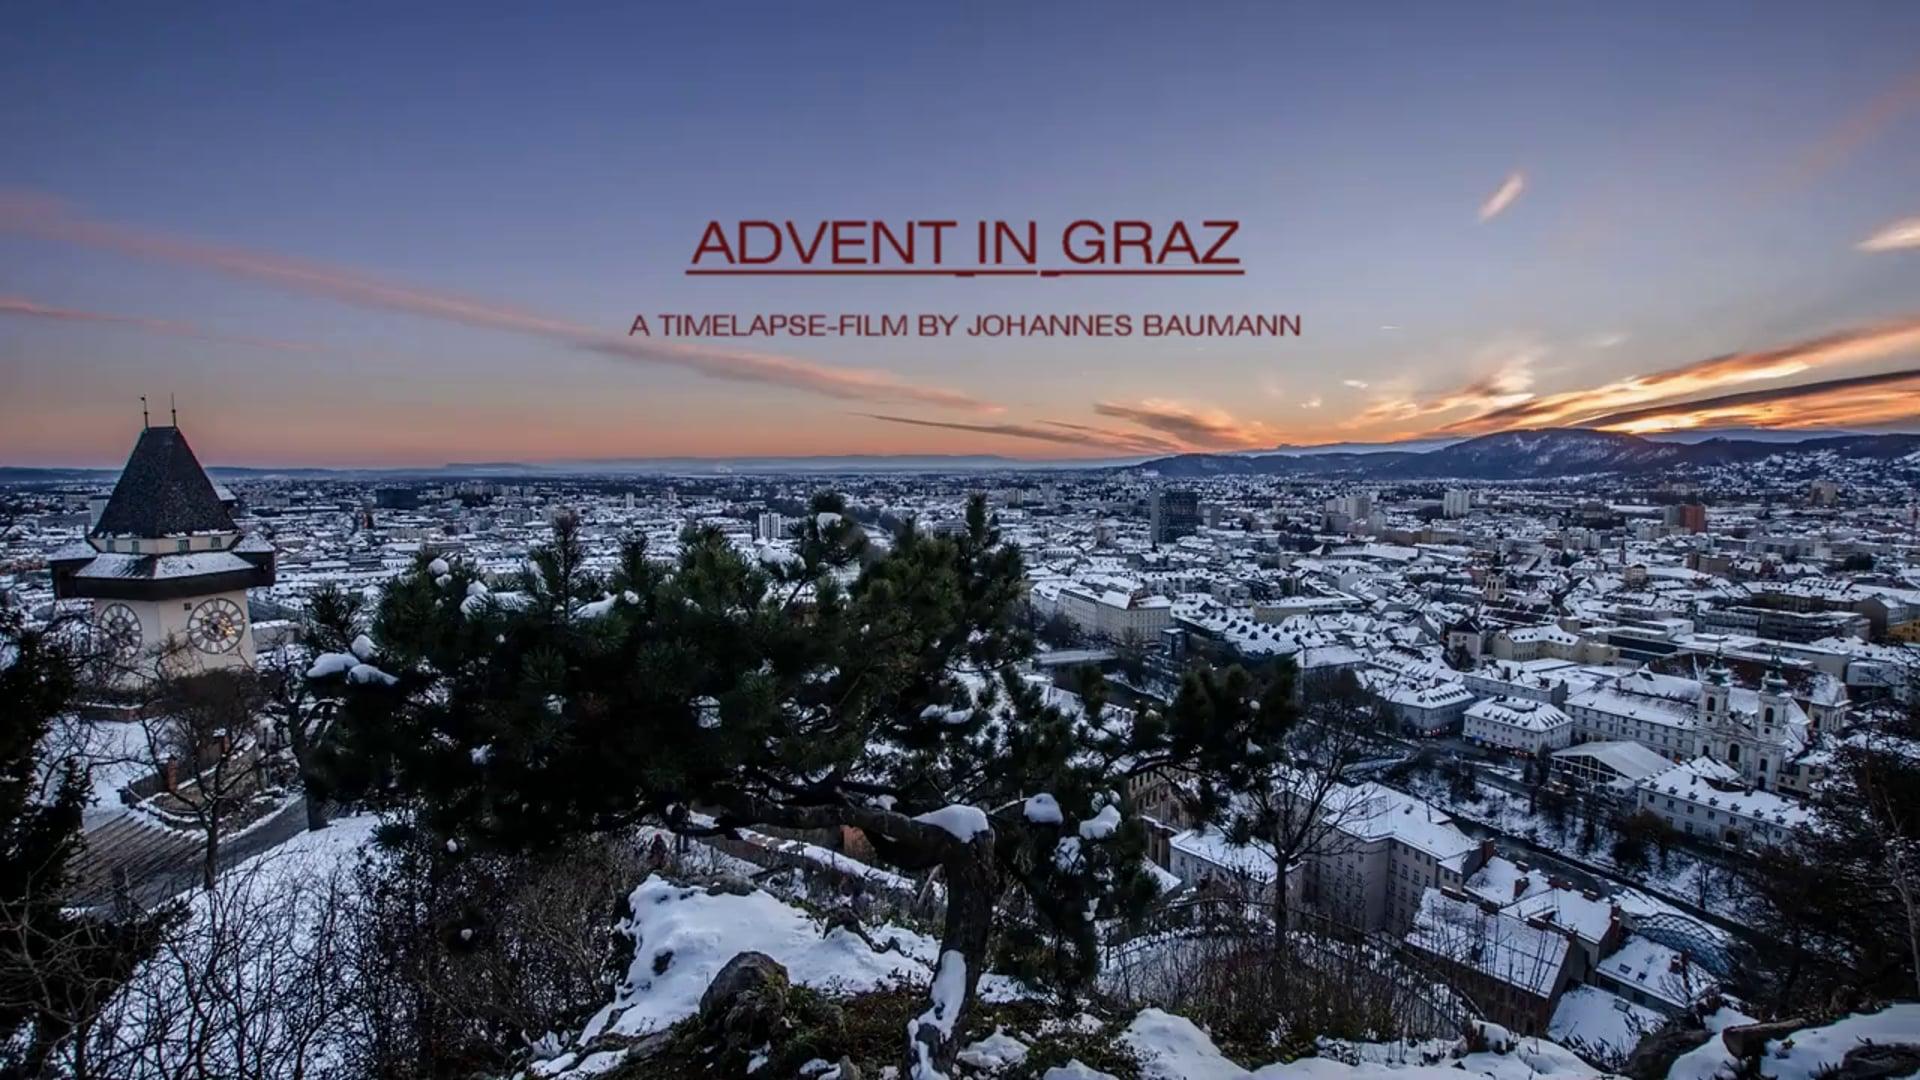 Advent in Graz - Timelapse